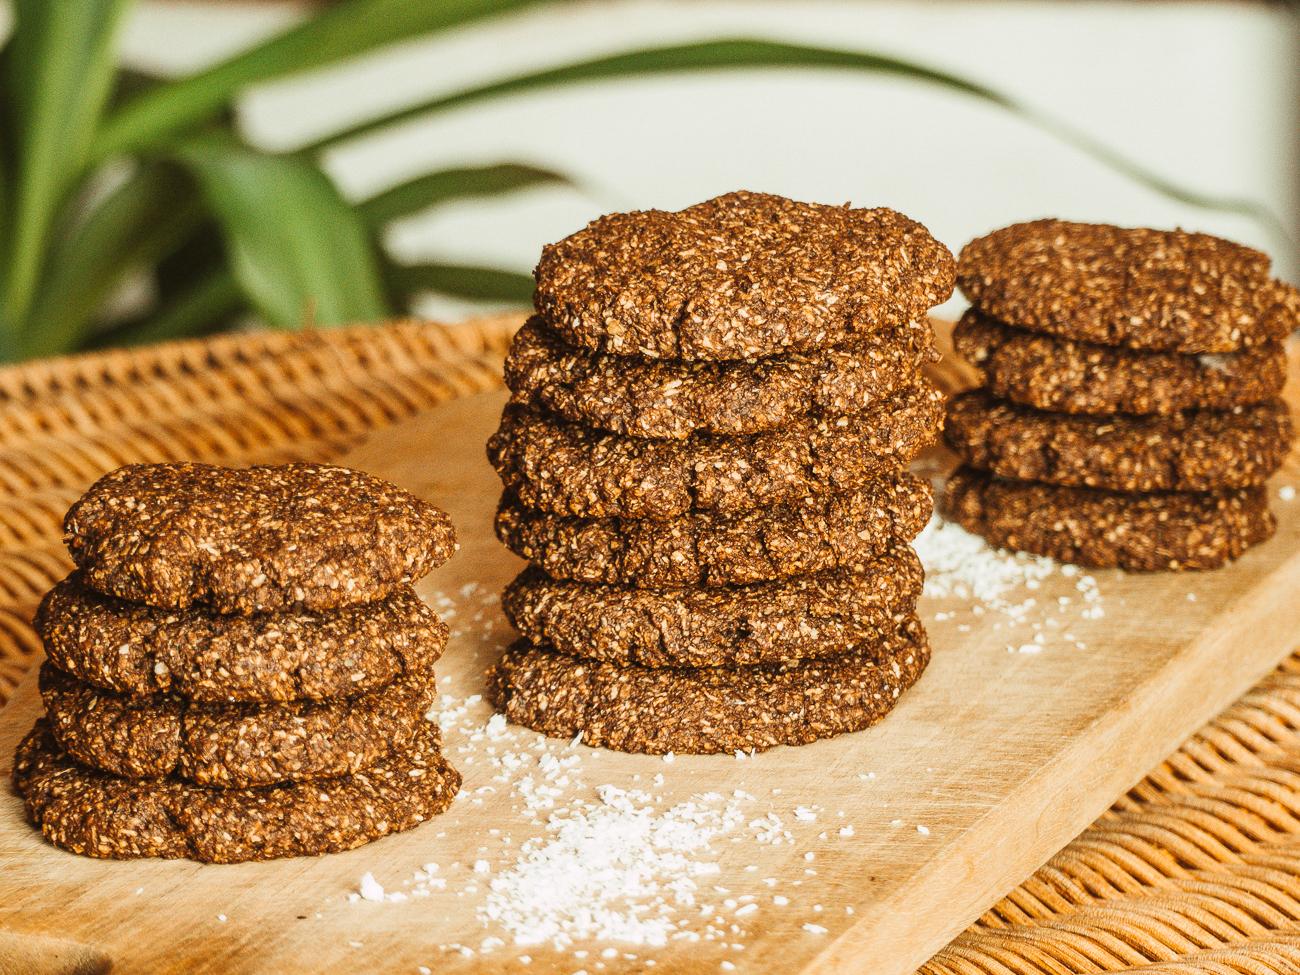 Vegane Schoko-Kokos Cookies Rezept - zuckerfrei & gesund